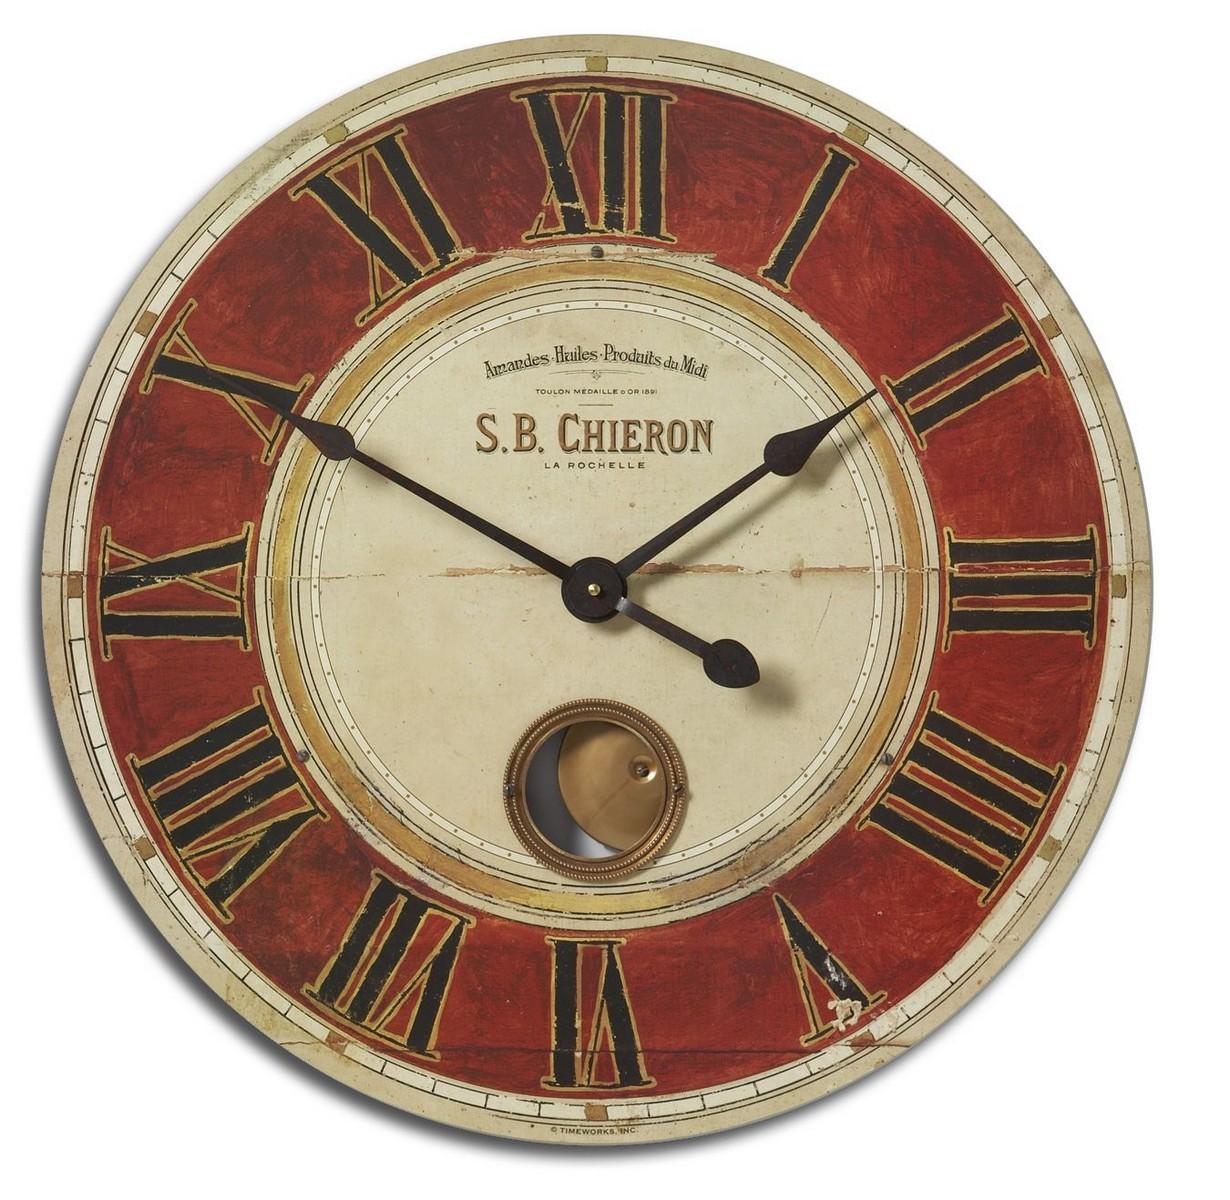 Uttermost S.B. Chieron 23 Wall Clock